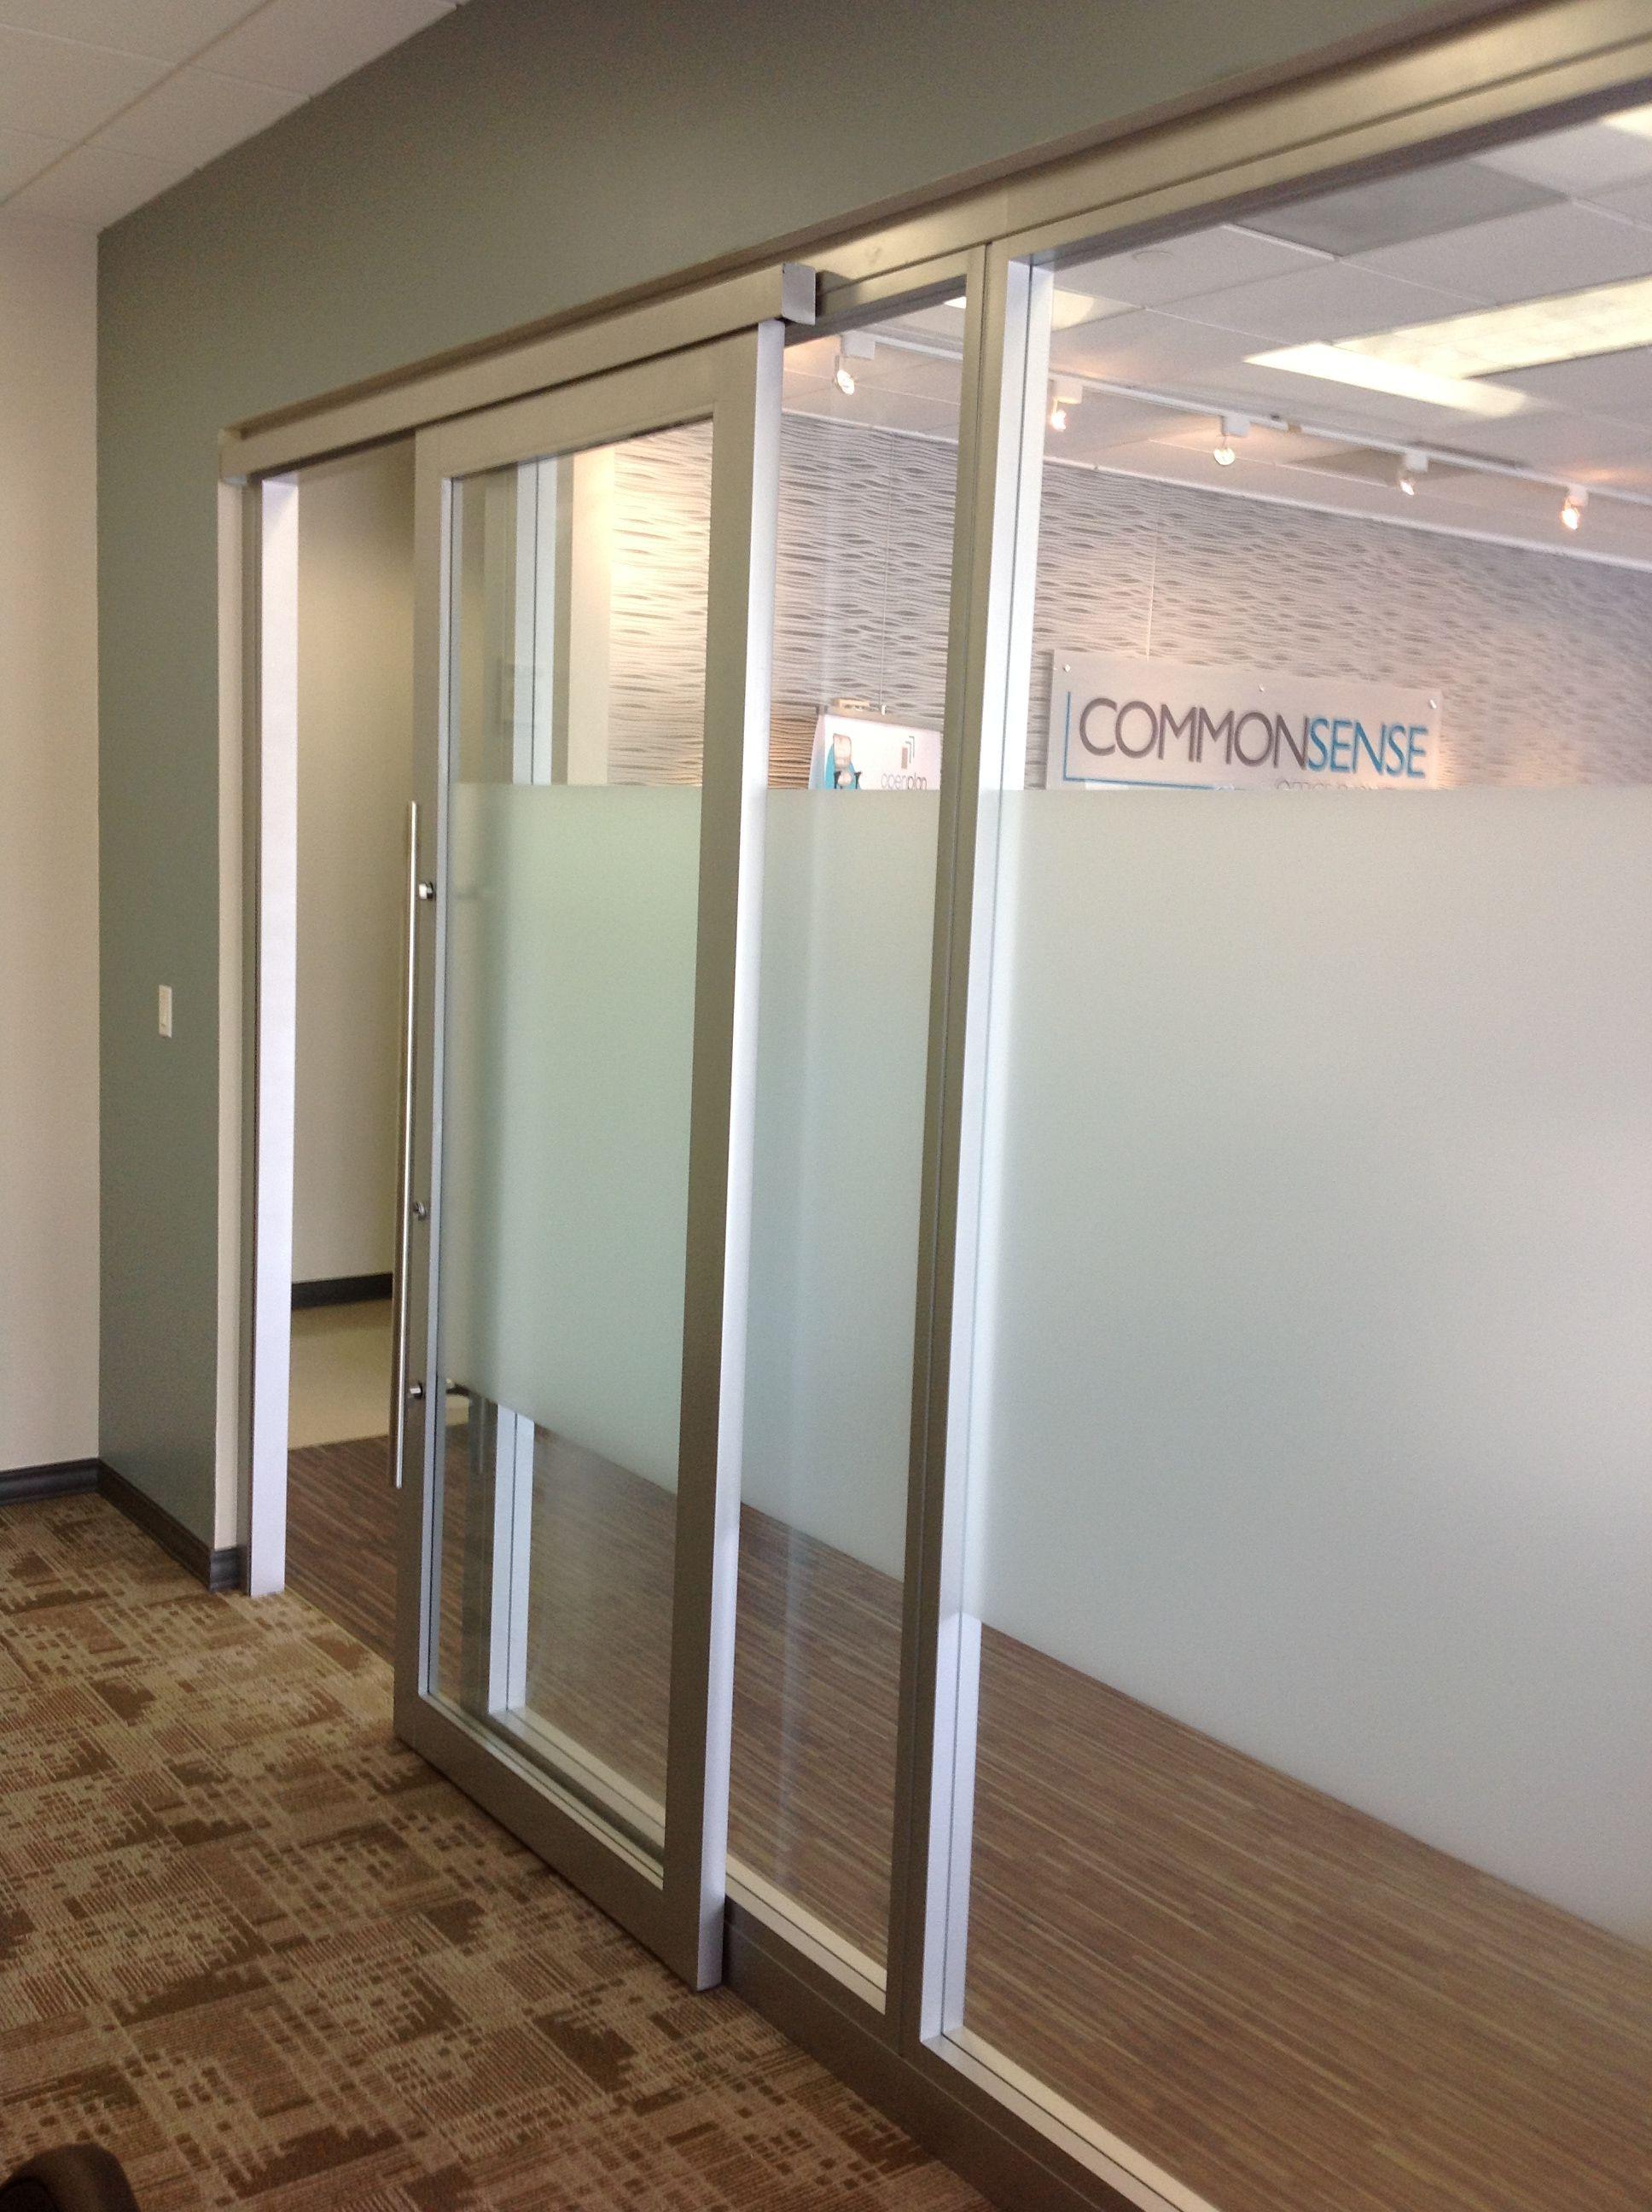 30 Luxury Sliding Door Curtain Wall In 2020 Glass Office Doors Sliding Door Curtains Sliding Doors